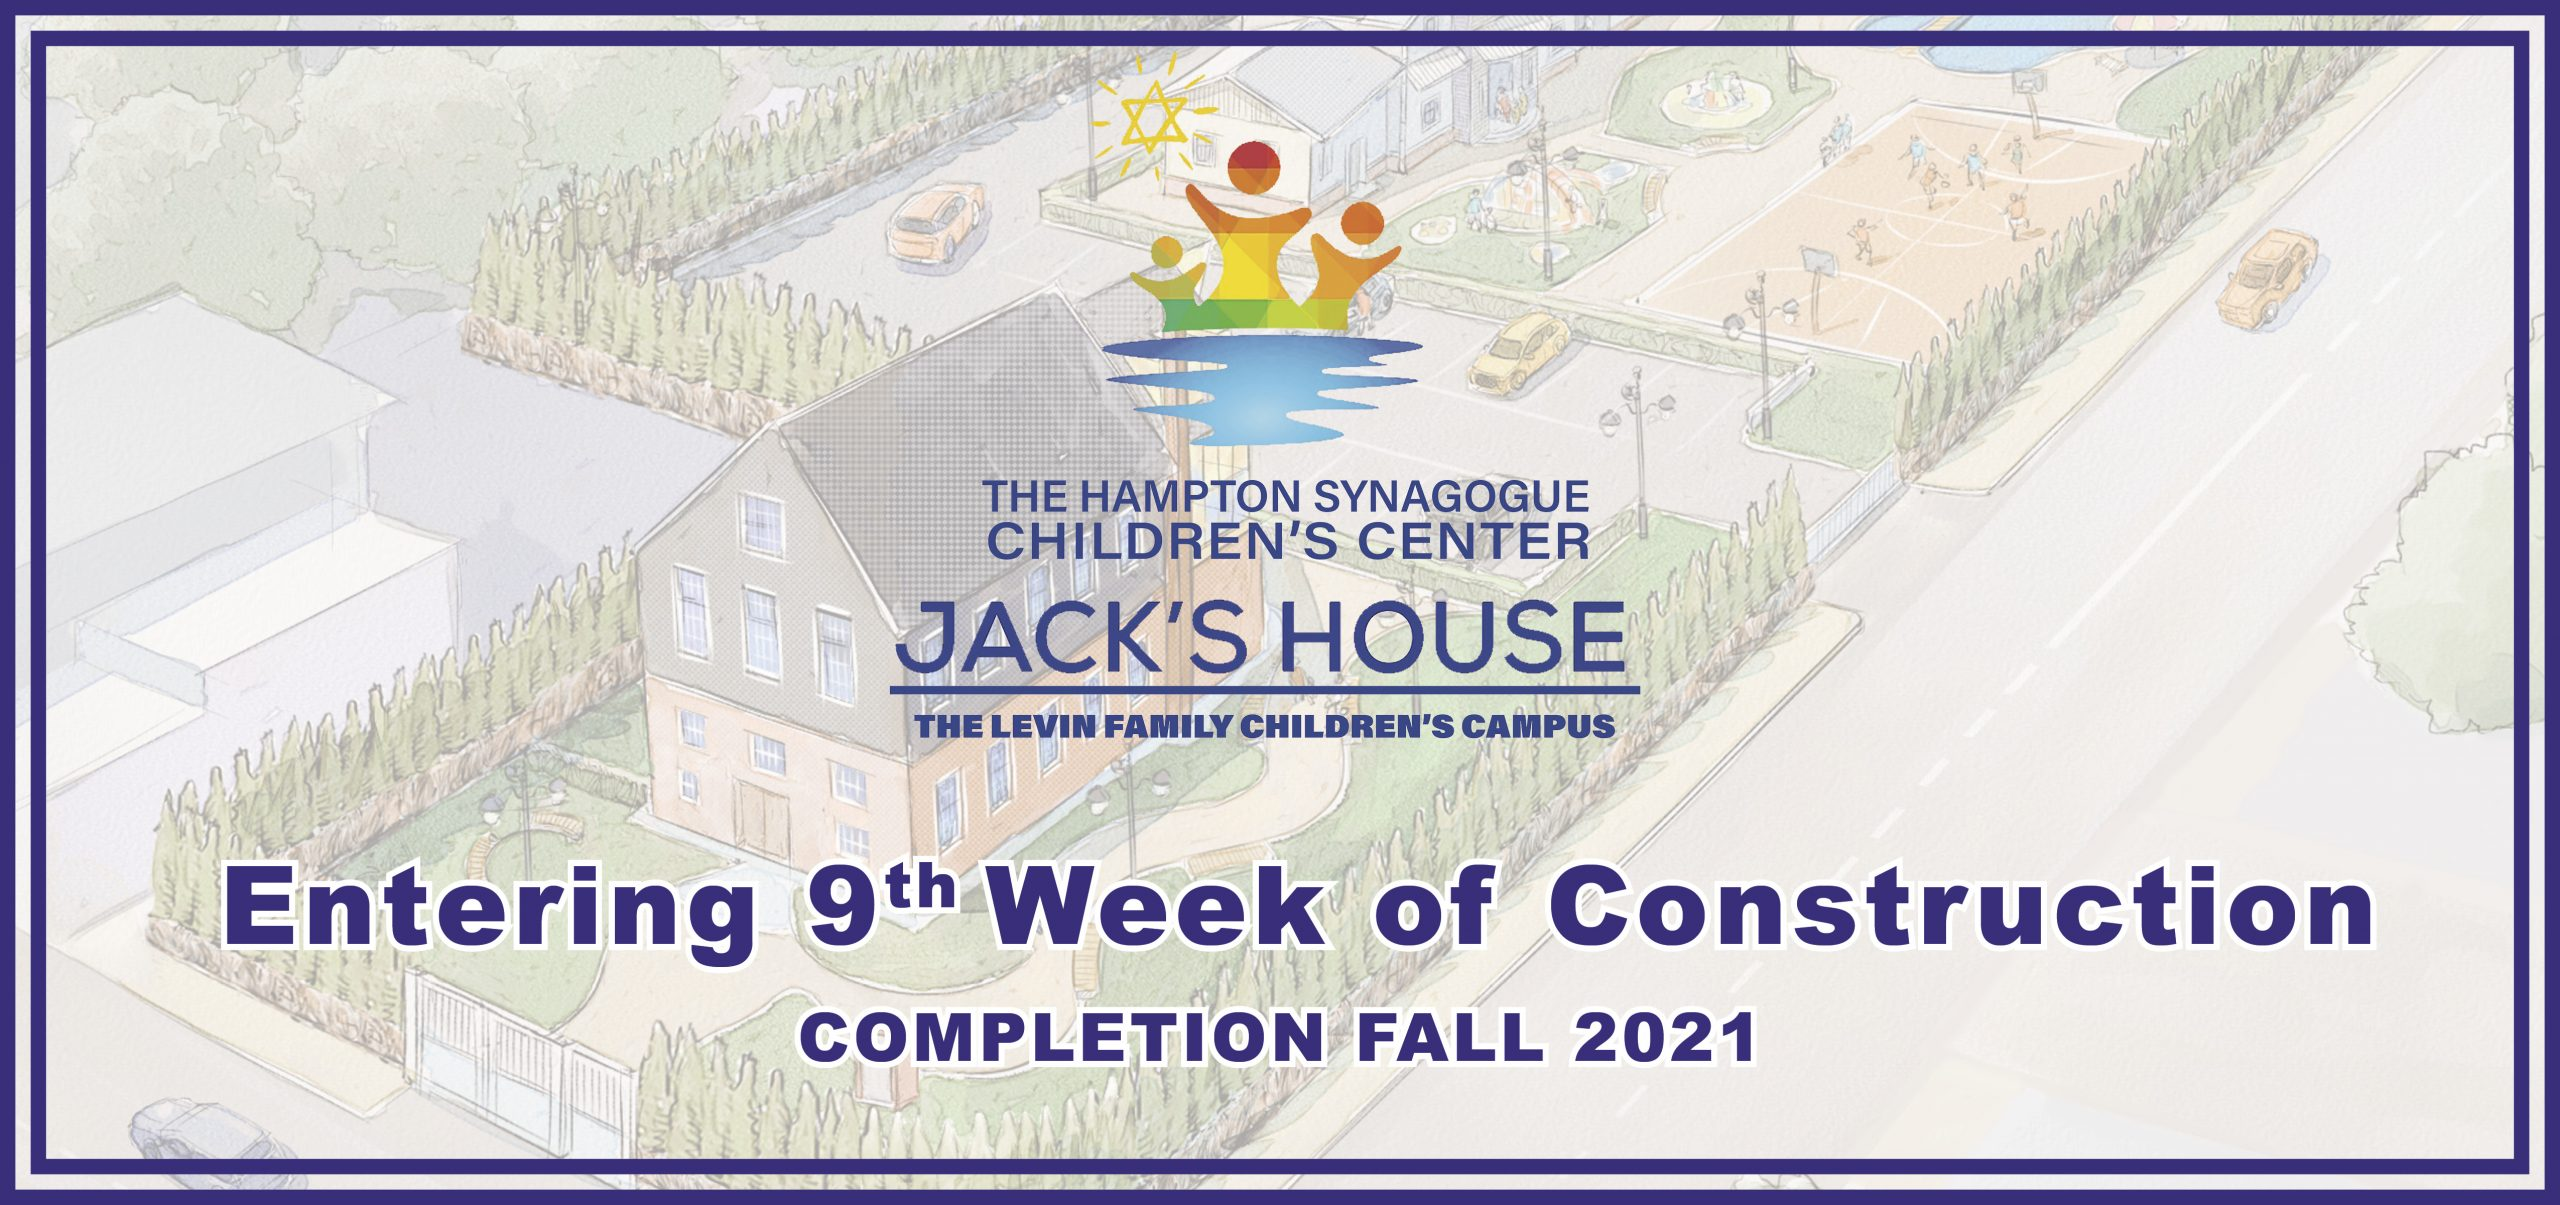 The Hampton Synagogue Children's Center – Construction Updates